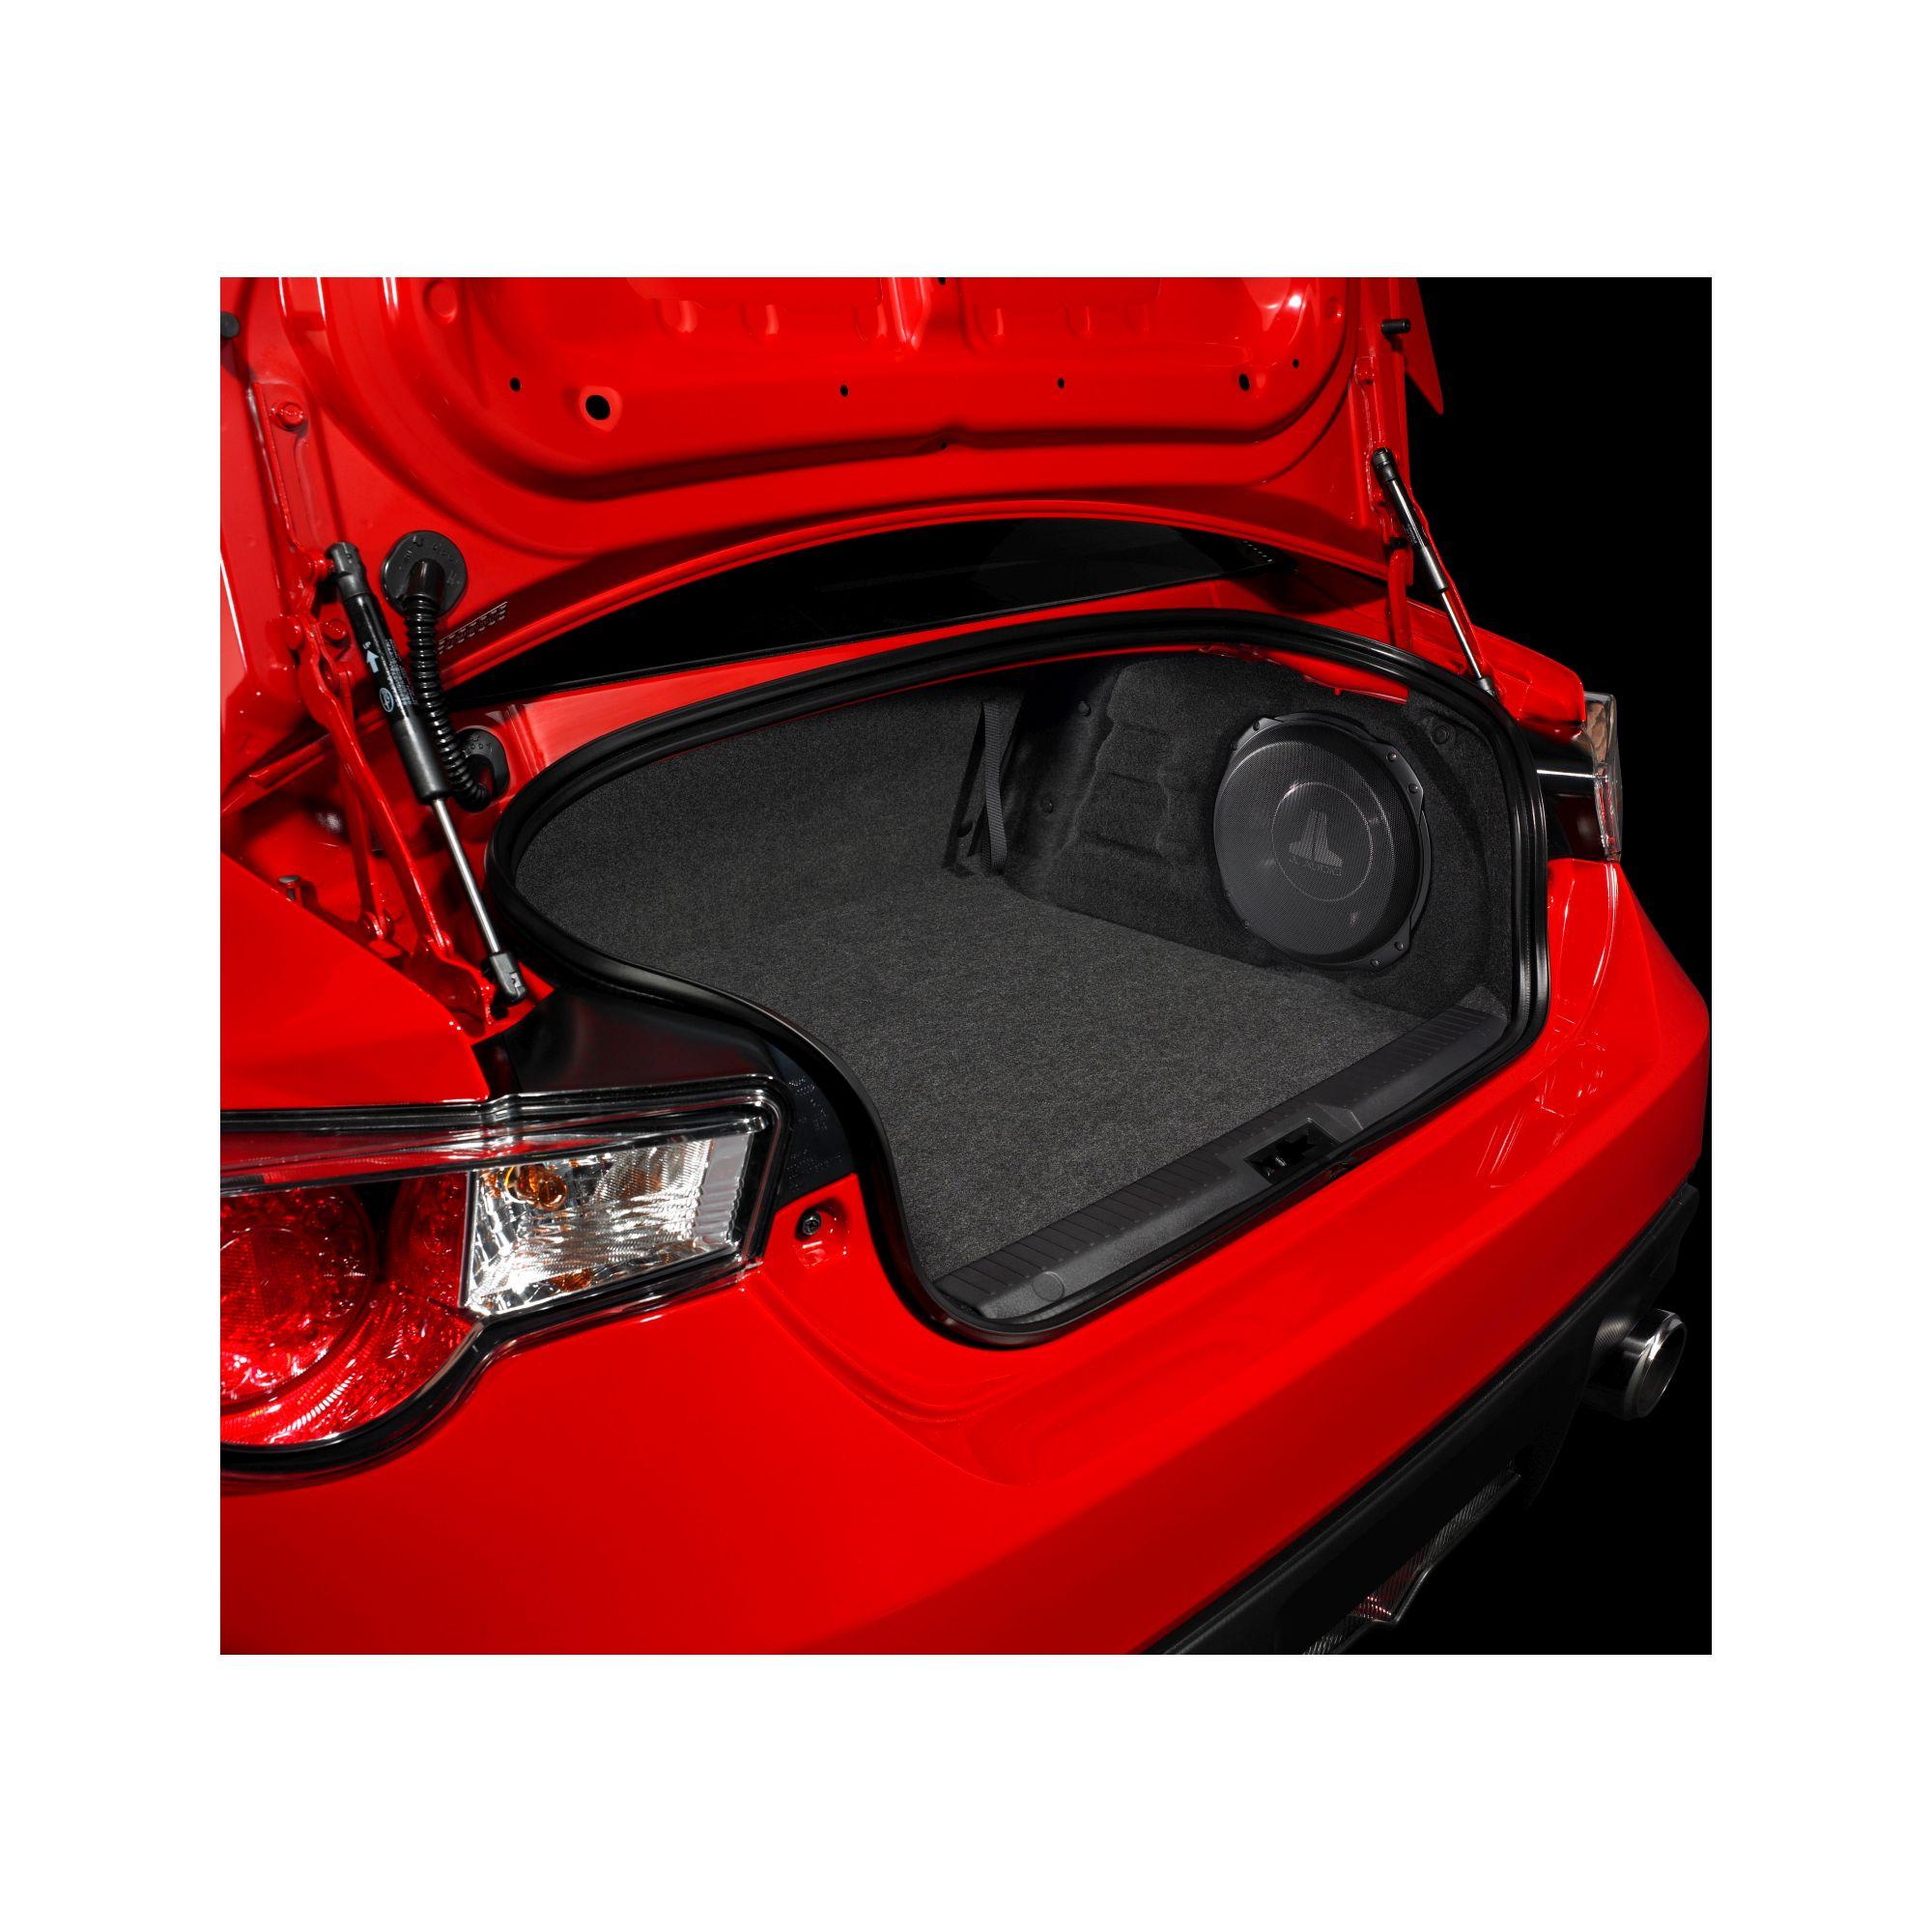 Jl Audio Sb S Brzfrs 10tw3 Stealthbox For 2013 Up Subaru Brz Scion Frs Fuse Box Fr Creative